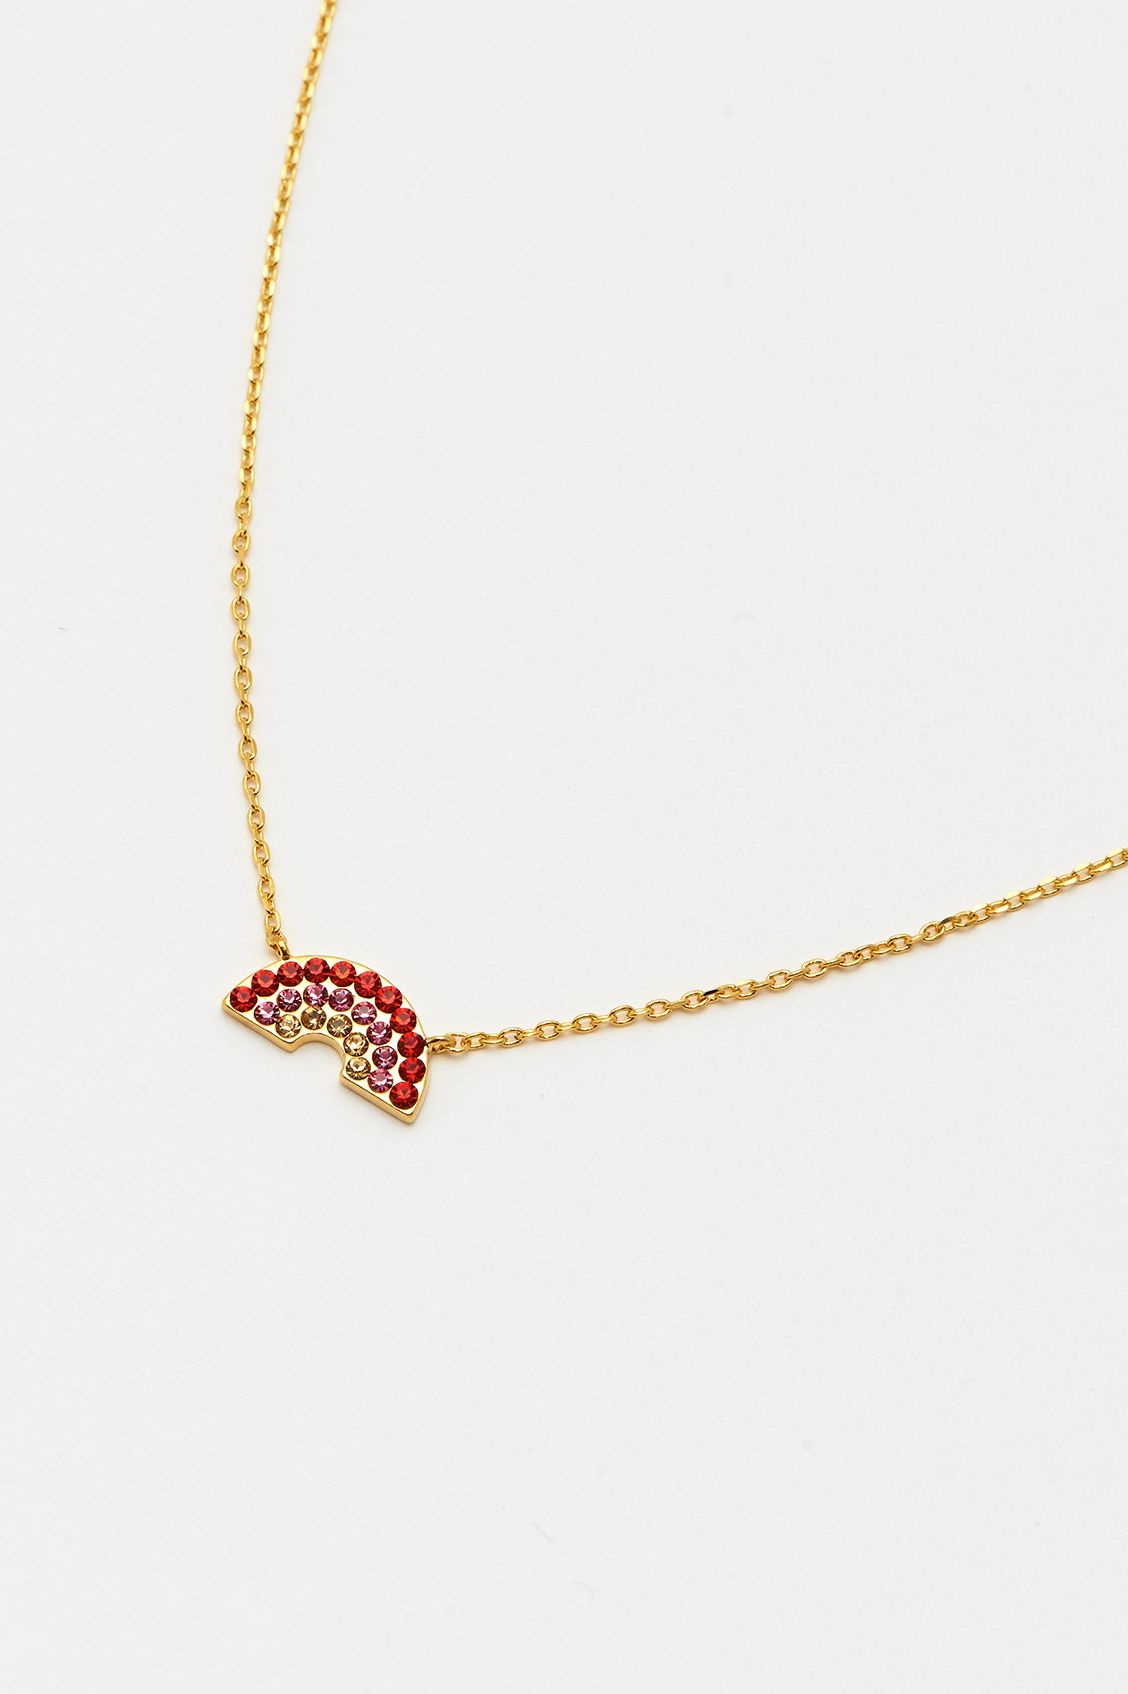 estella bartlett [EB1318C] Rainbow Necklace with CZ